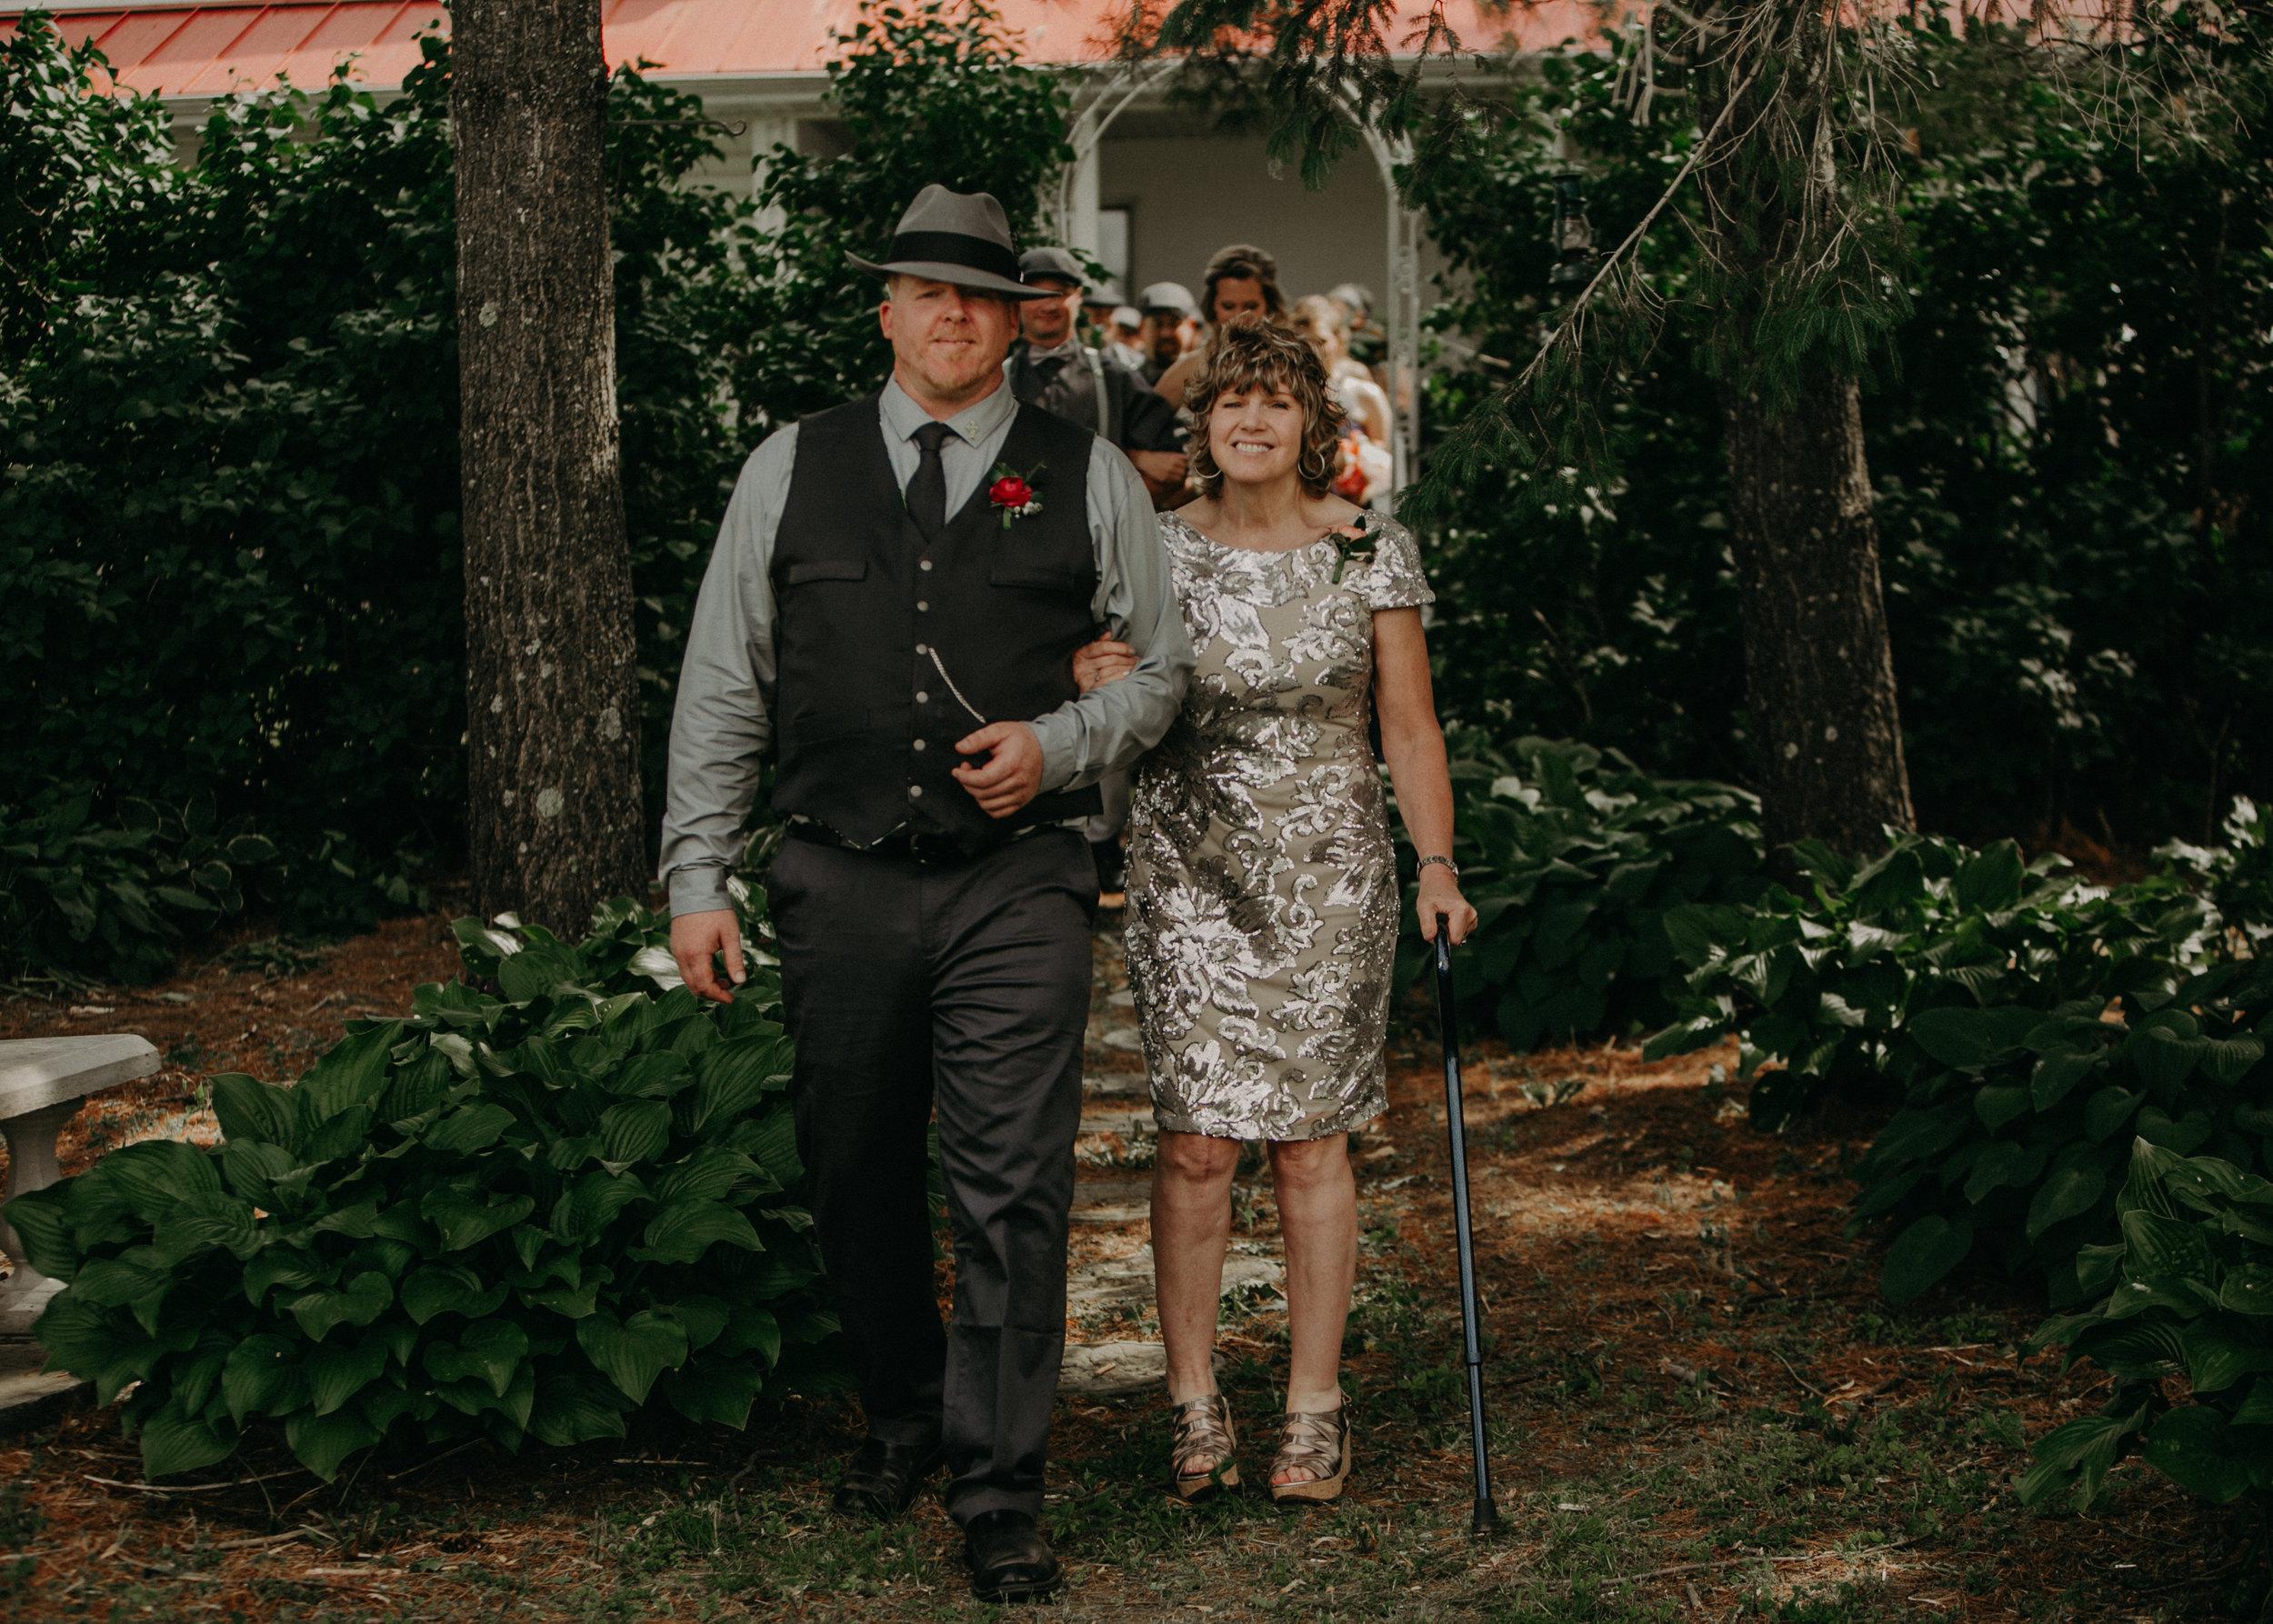 Ellsworth_WI_Barn_Jean_Acres_Wedding_AWP (30 of 57).jpg